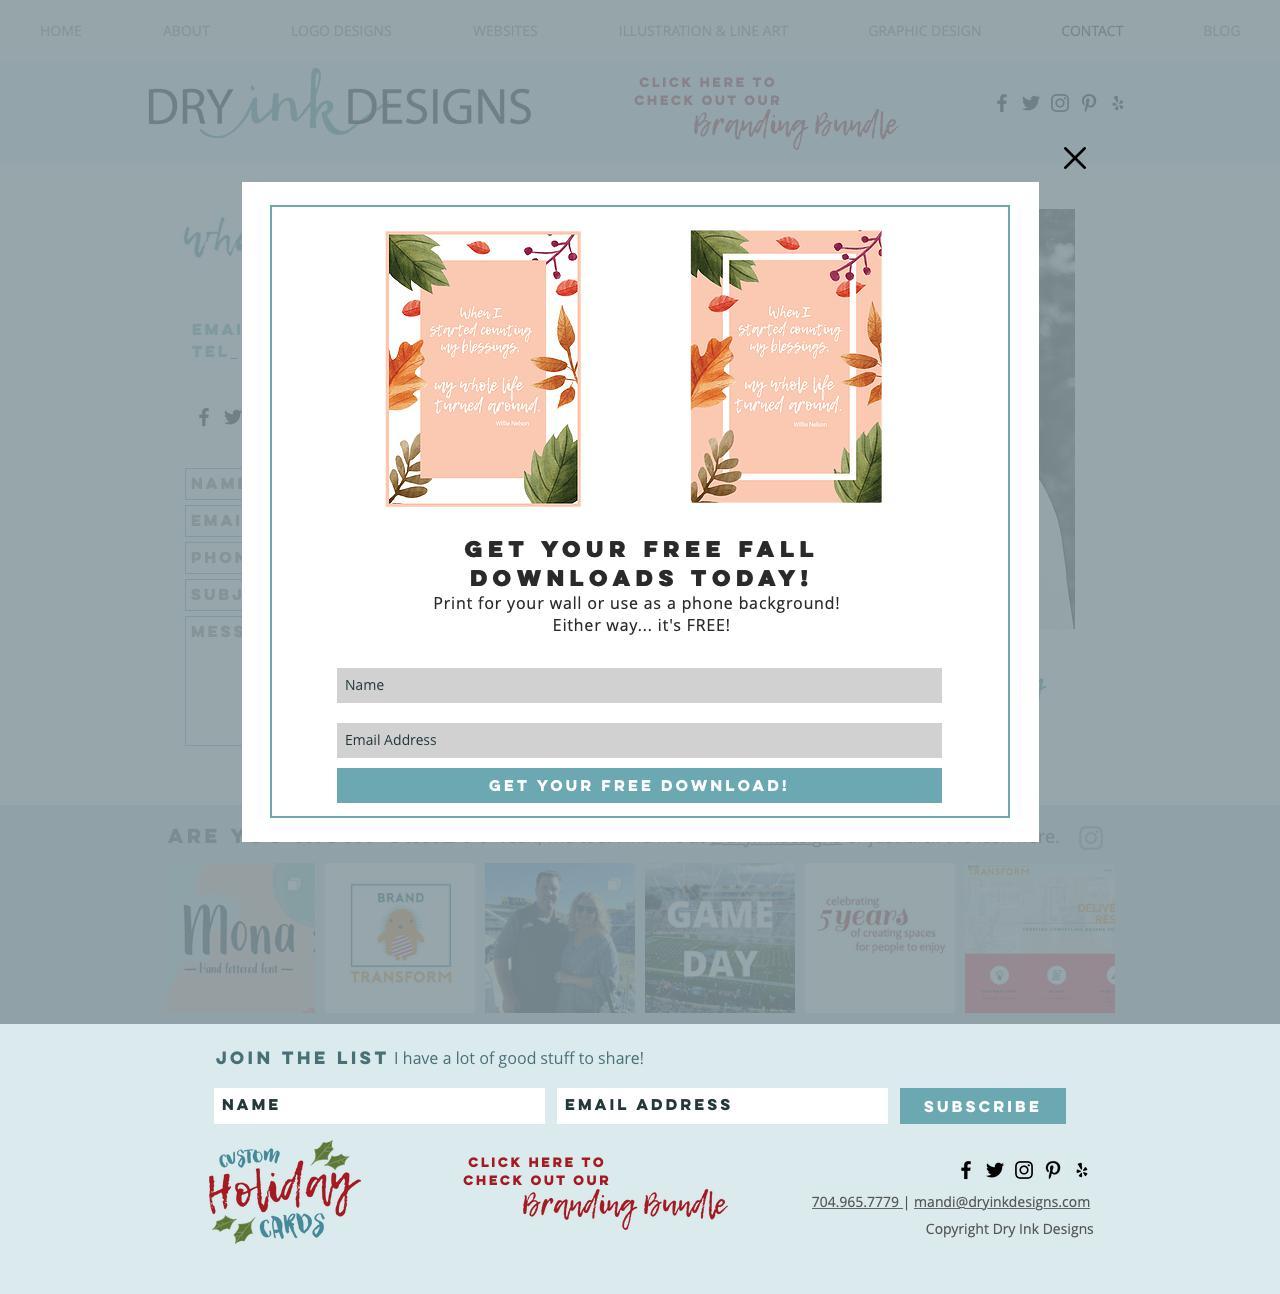 Screenshot of dryinkdesigns.com - Contact | Dry Ink Designs - captured Nov. 6, 2018